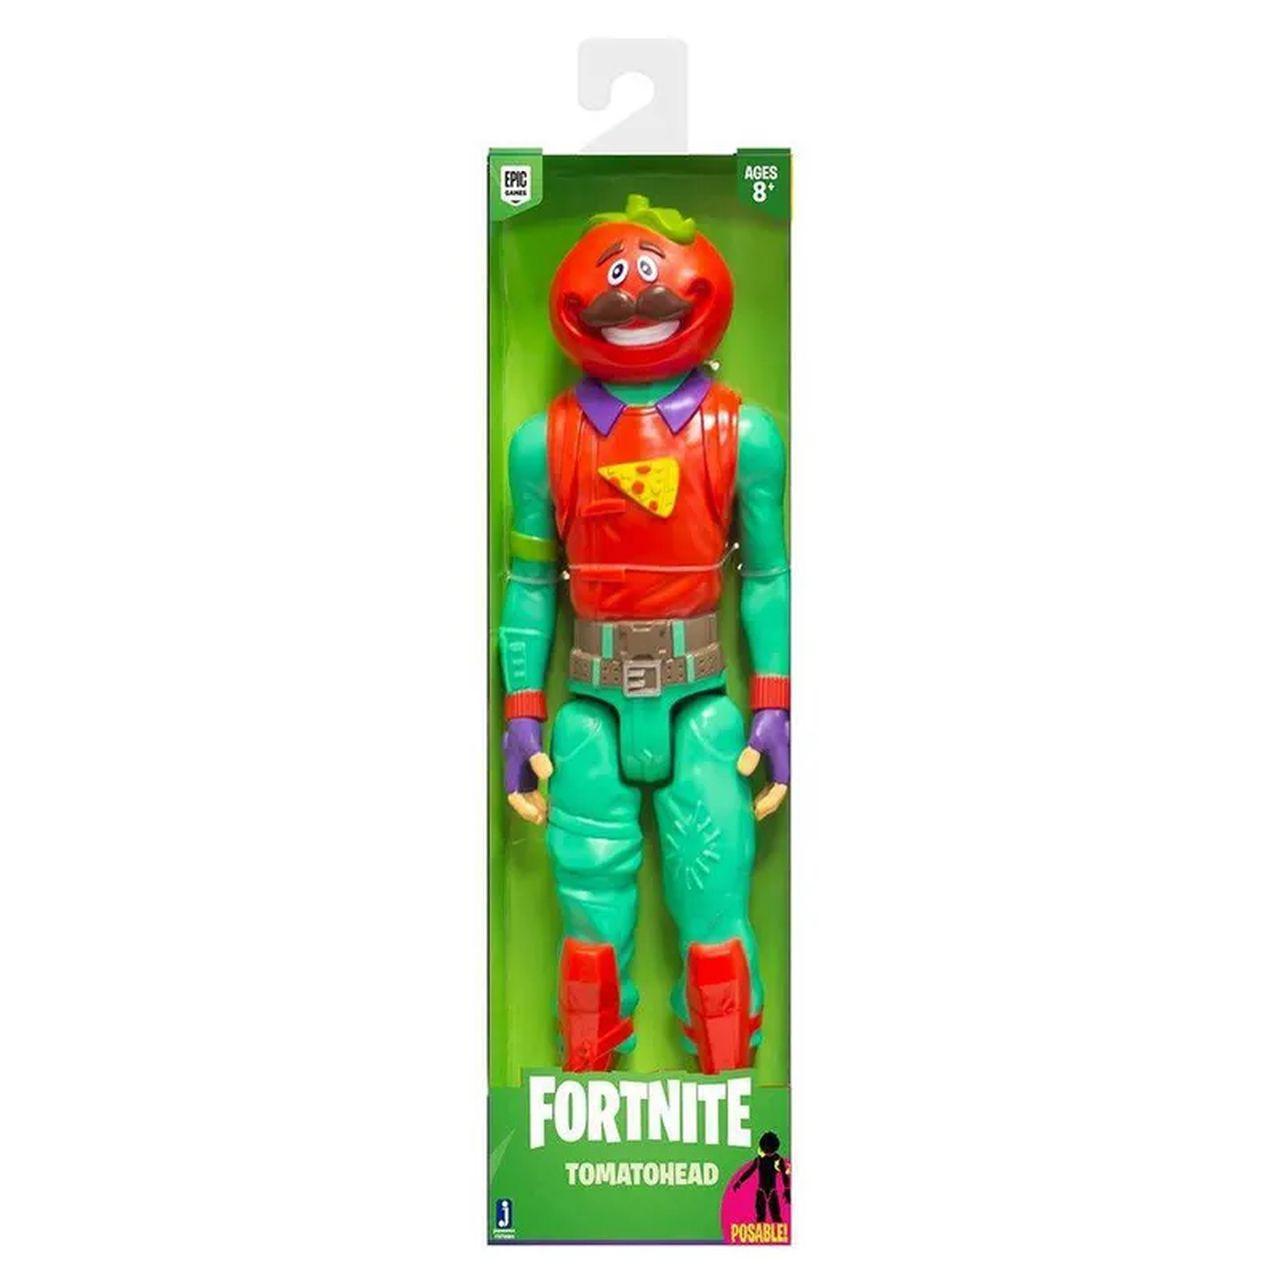 Novo Fortnite - Figura Boneco Tomatohead - 30 cm - Original